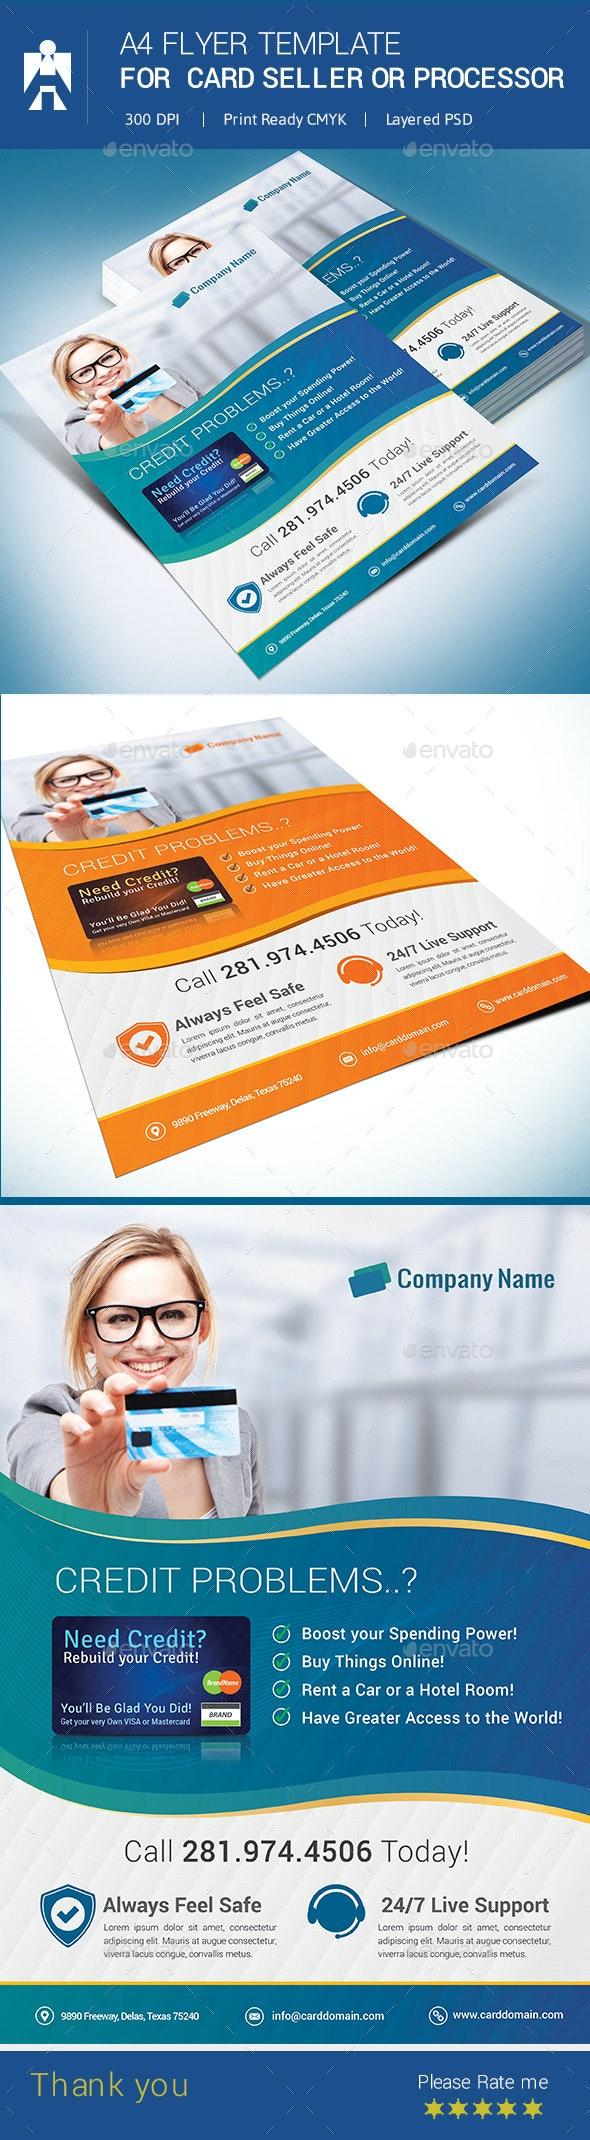 A4 Flyer for Debit Card or Credit Card Seller - Commerce Flyers